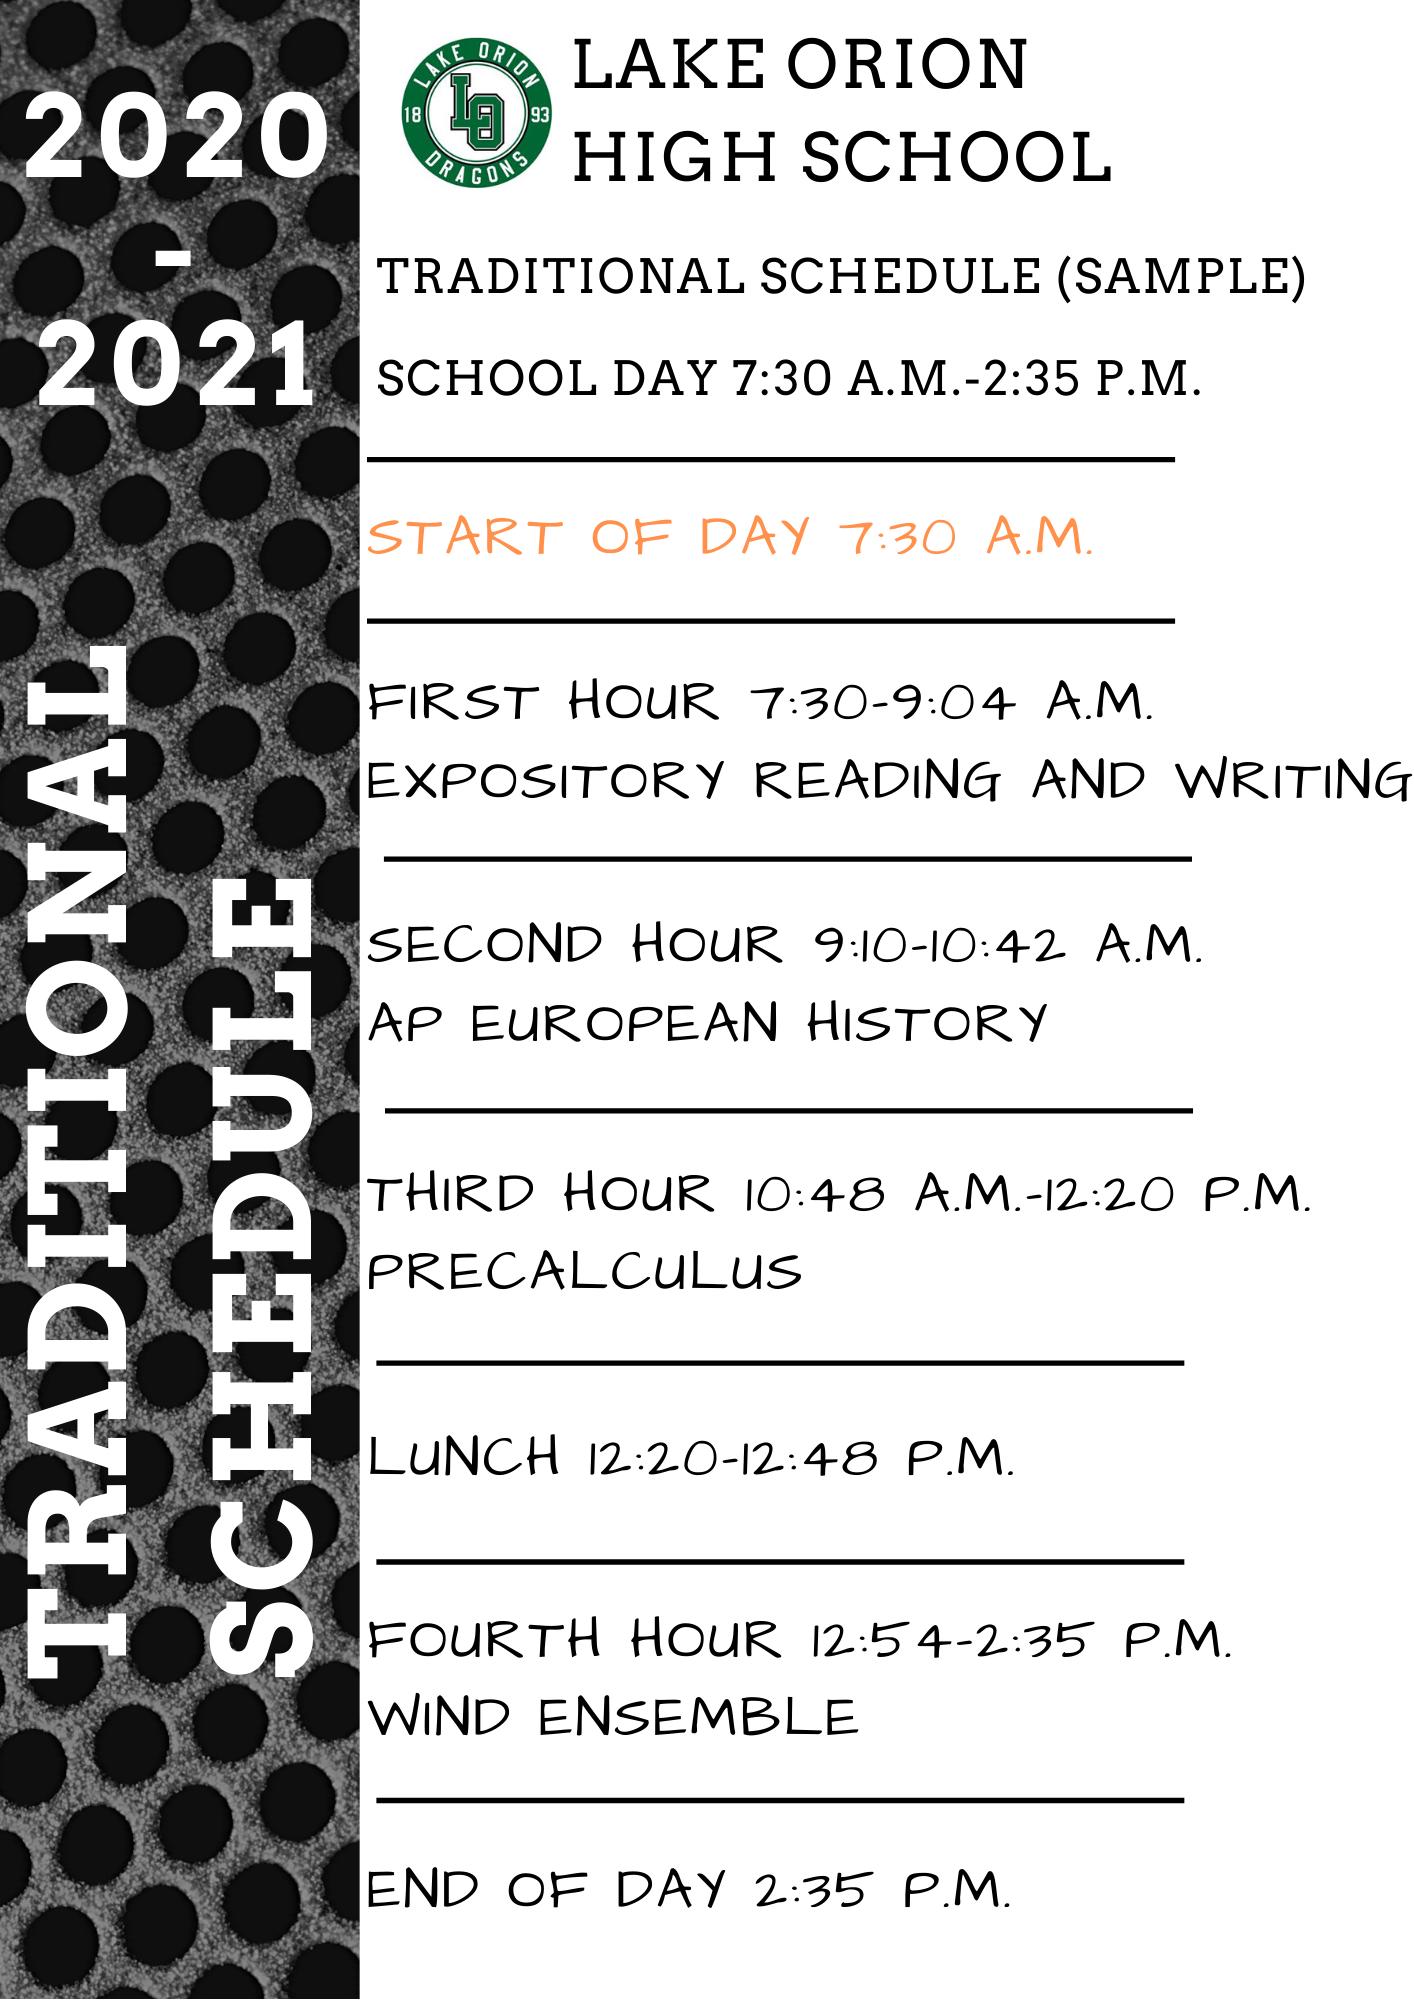 Flexible Schedule Option - Lake Orion Community Schools with regard to Lake Orion School Calendar 2021